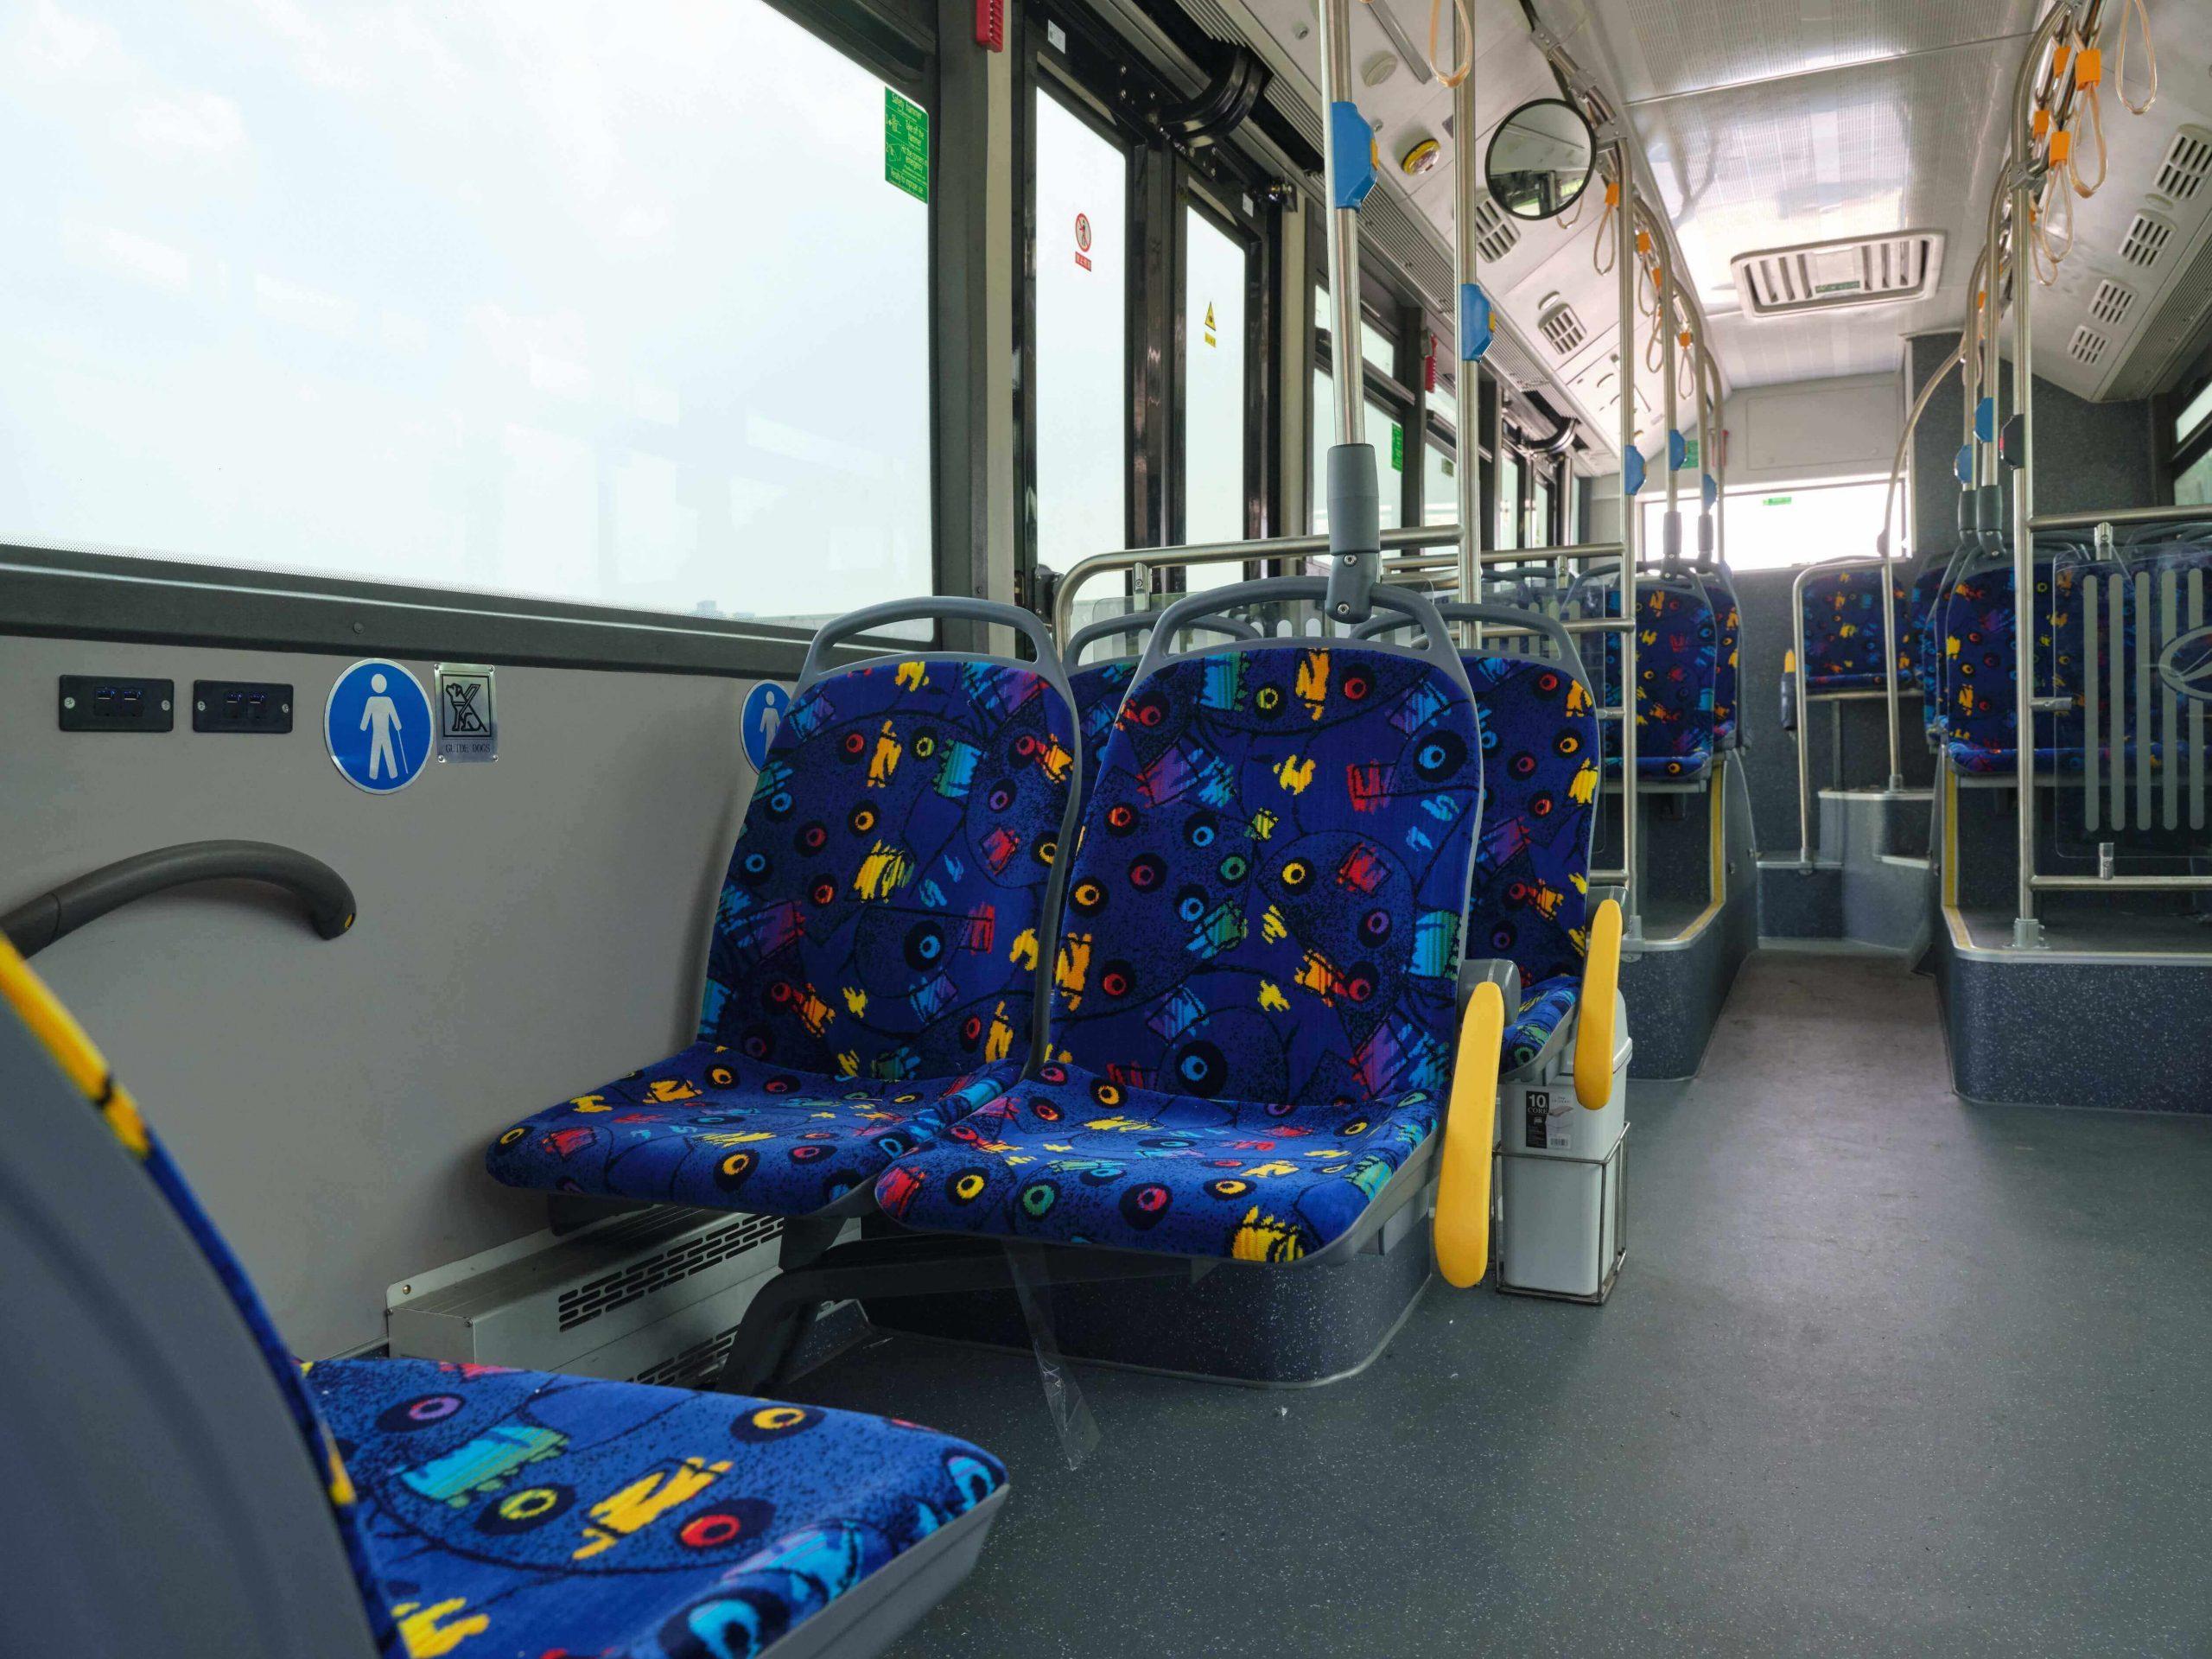 Chariot e-bus interior